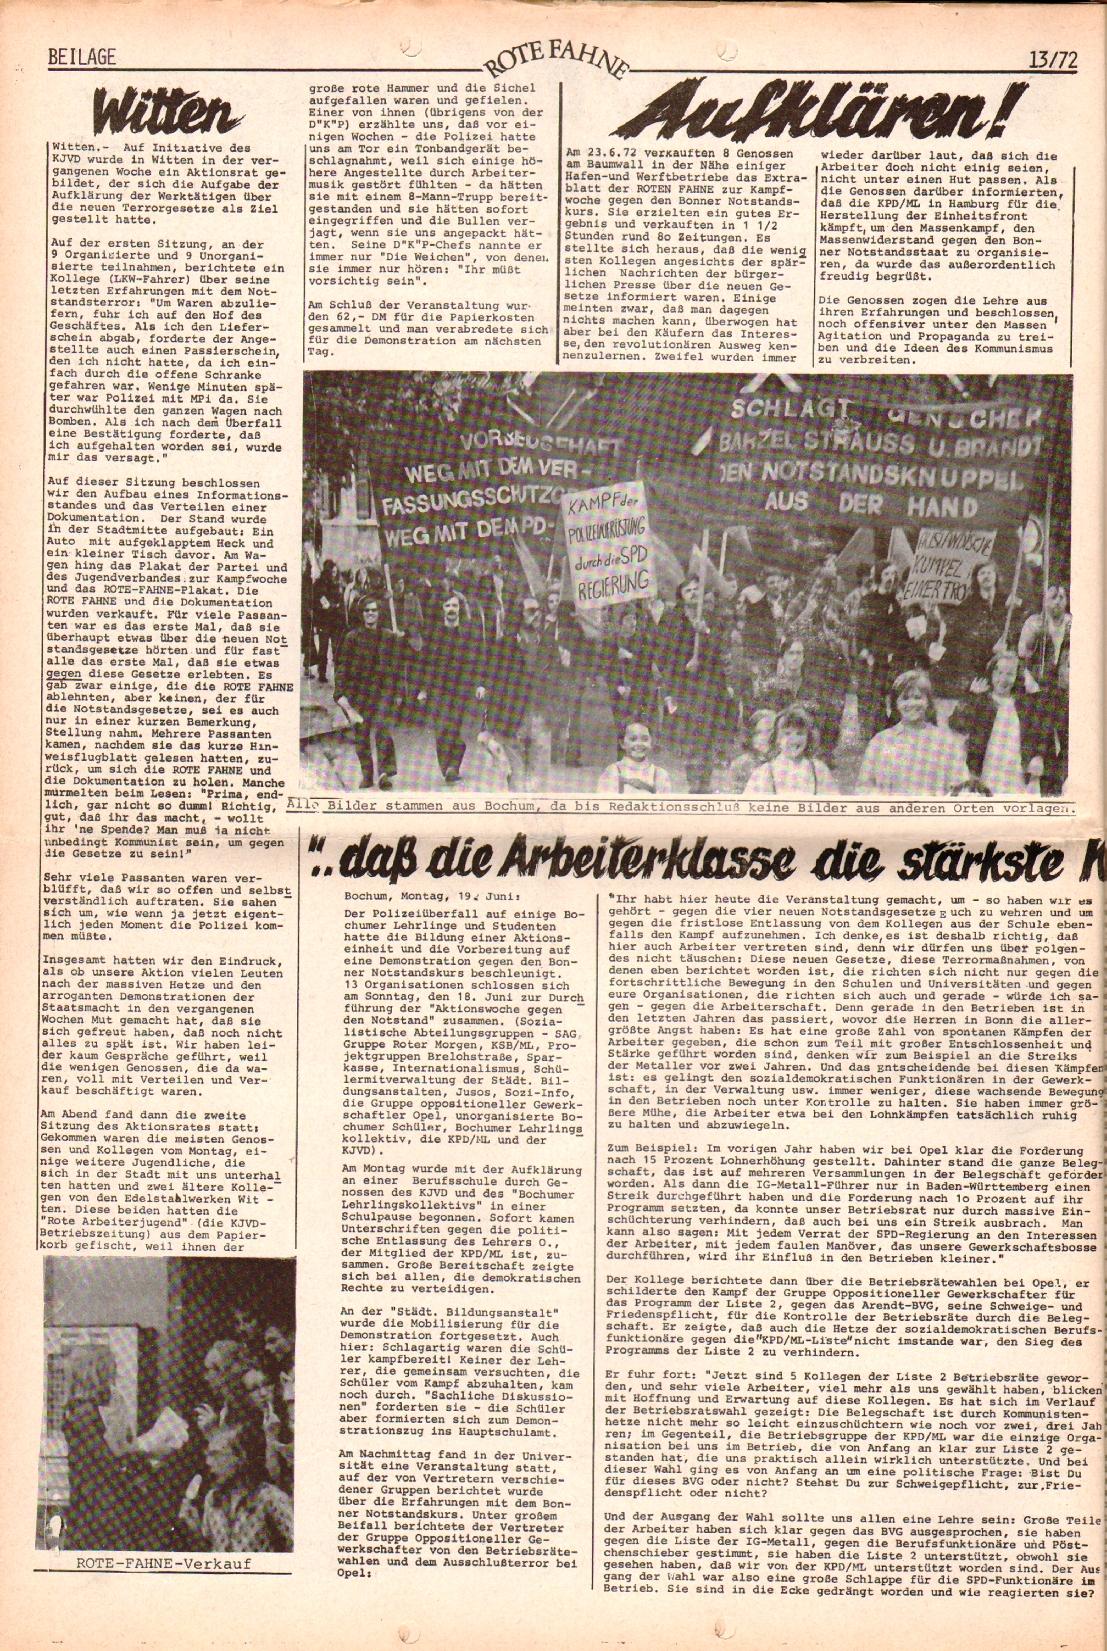 Rote Fahne, 3. Jg., 28.6.1972, Nr. 13, Beilage, Seite 2